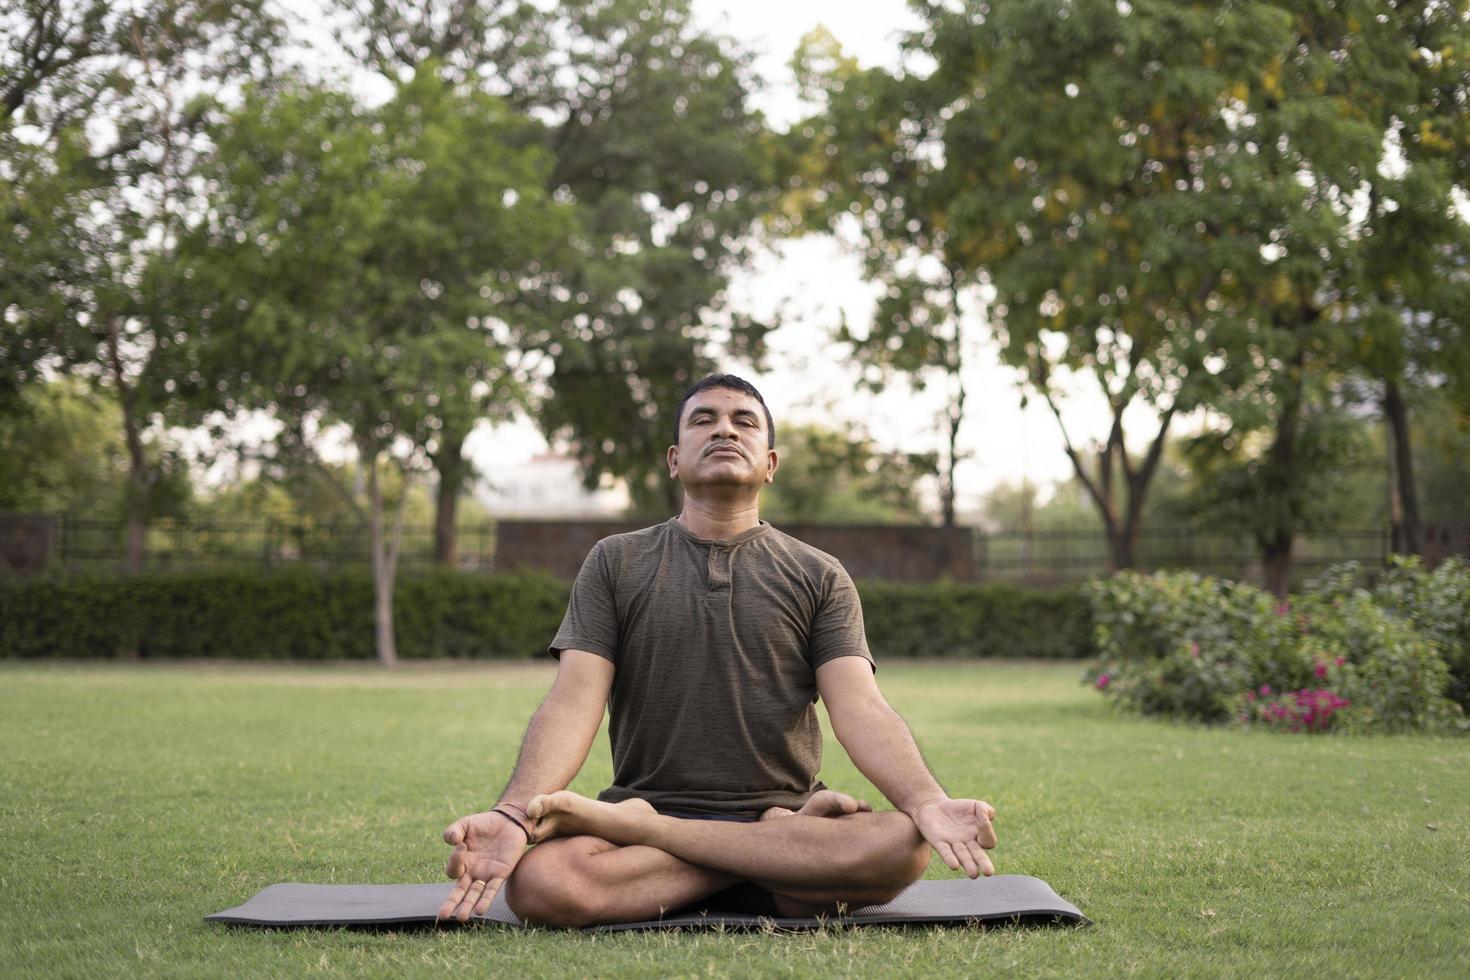 Mann macht Yoga im Freien foto